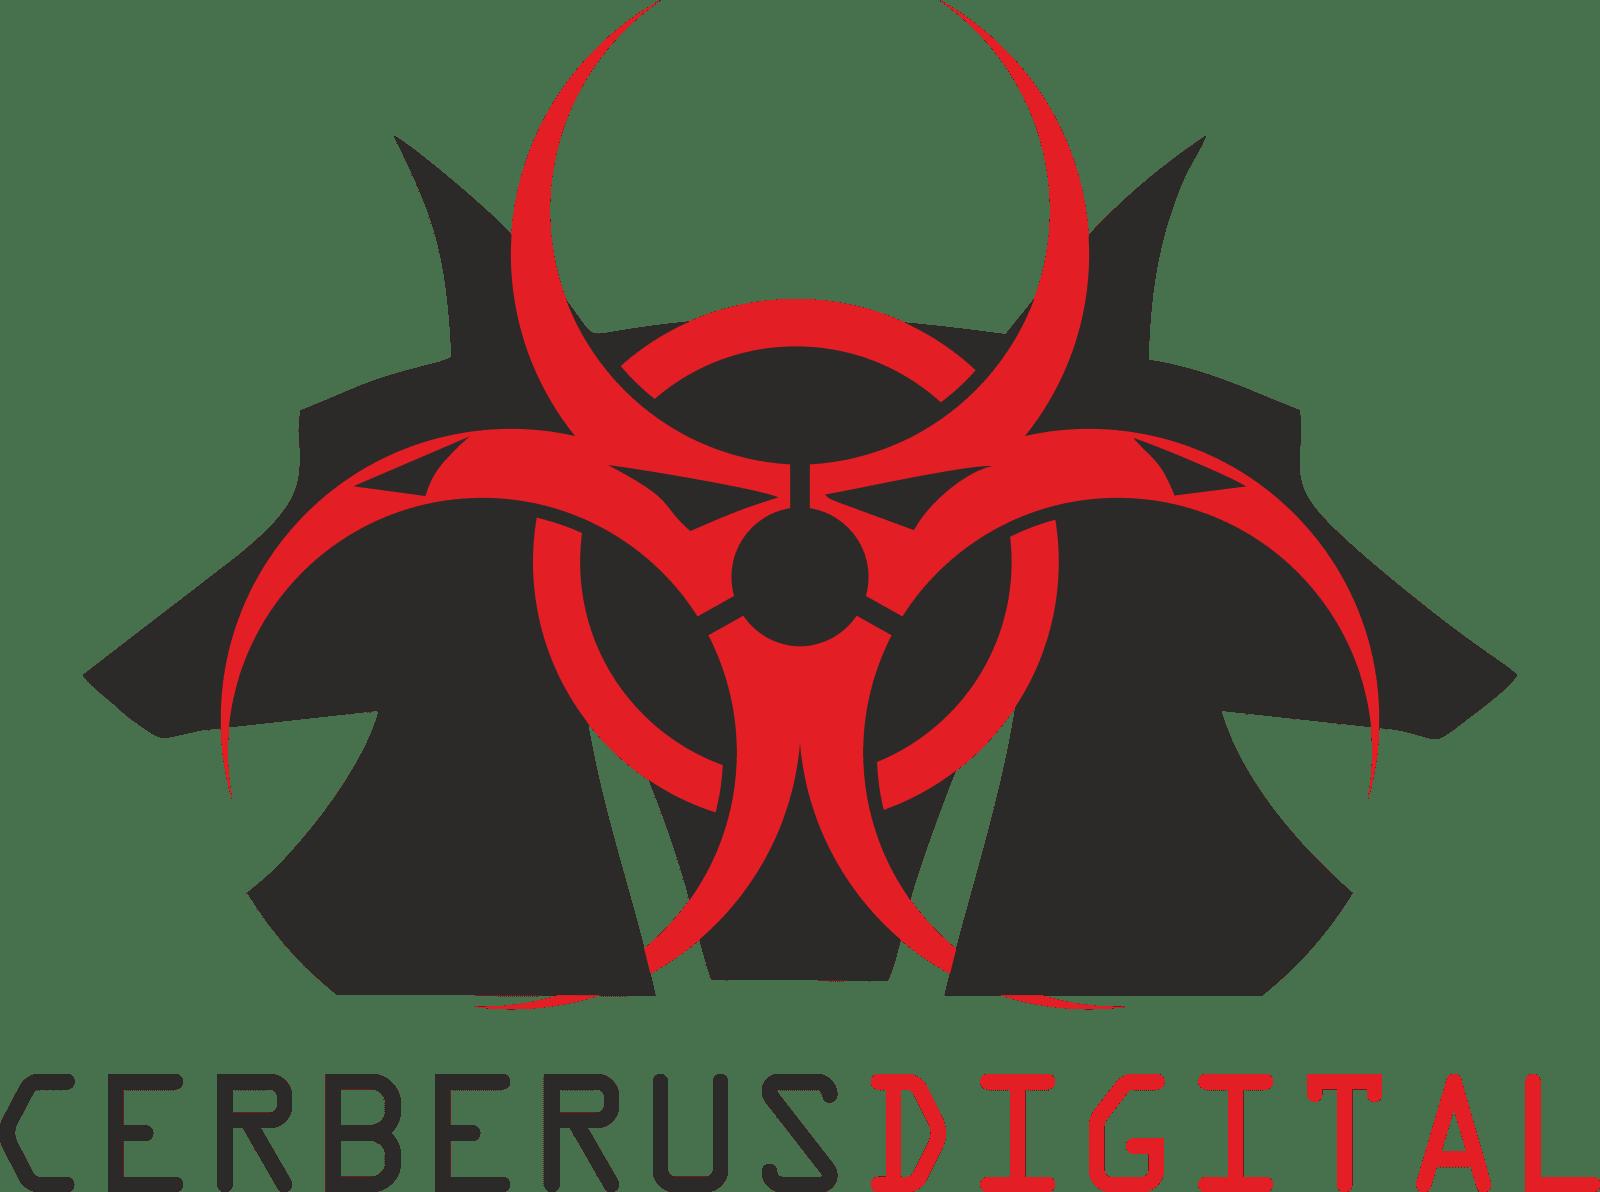 Cerberus Digital